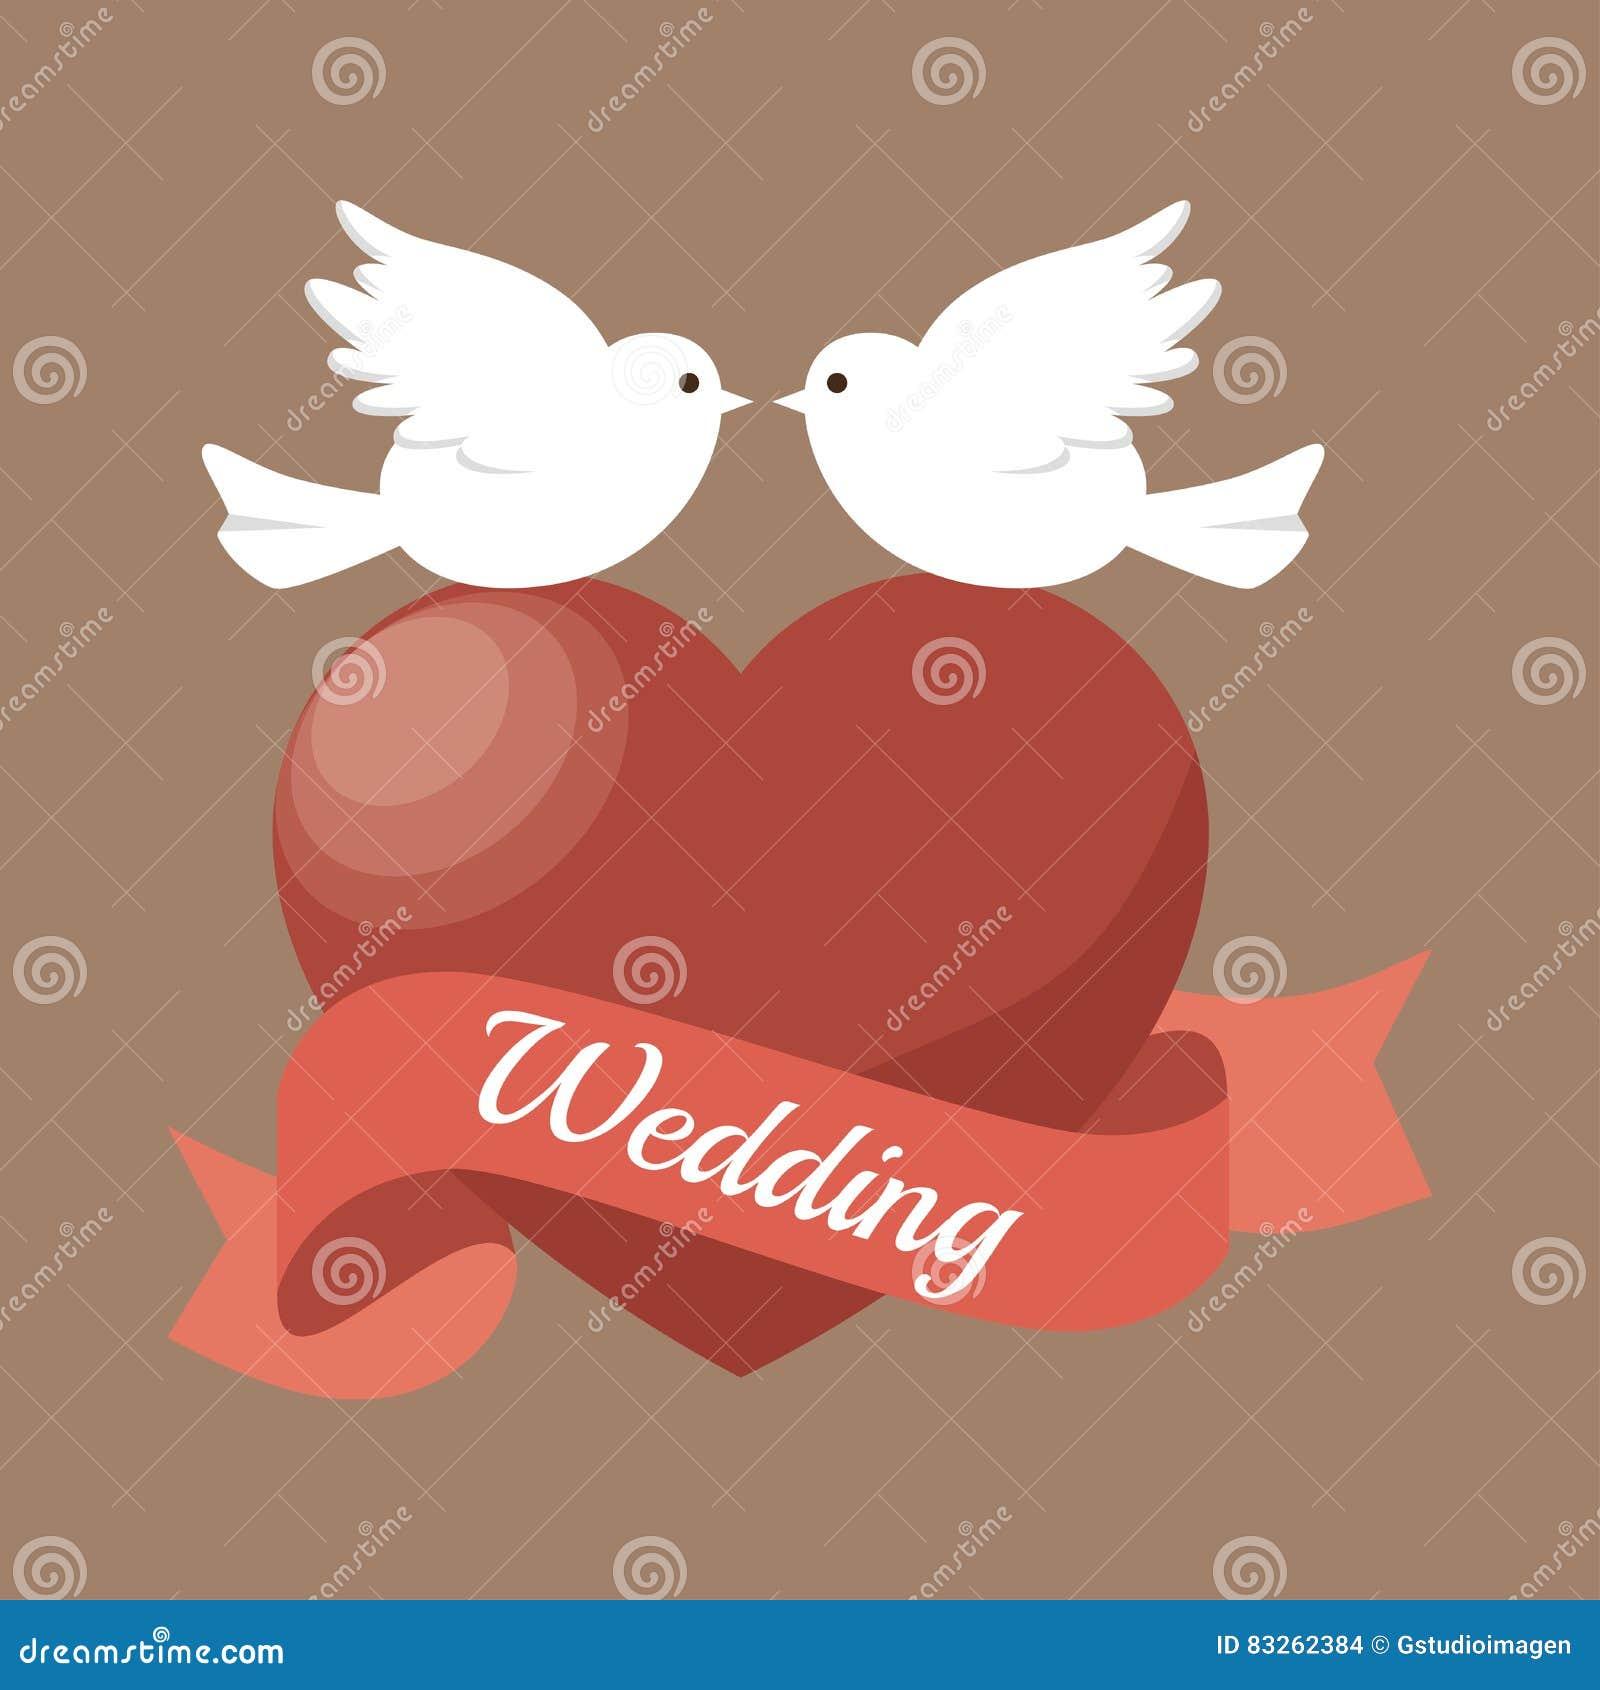 Wedding Invitation Card Icon Stock Illustration - Illustration of ...